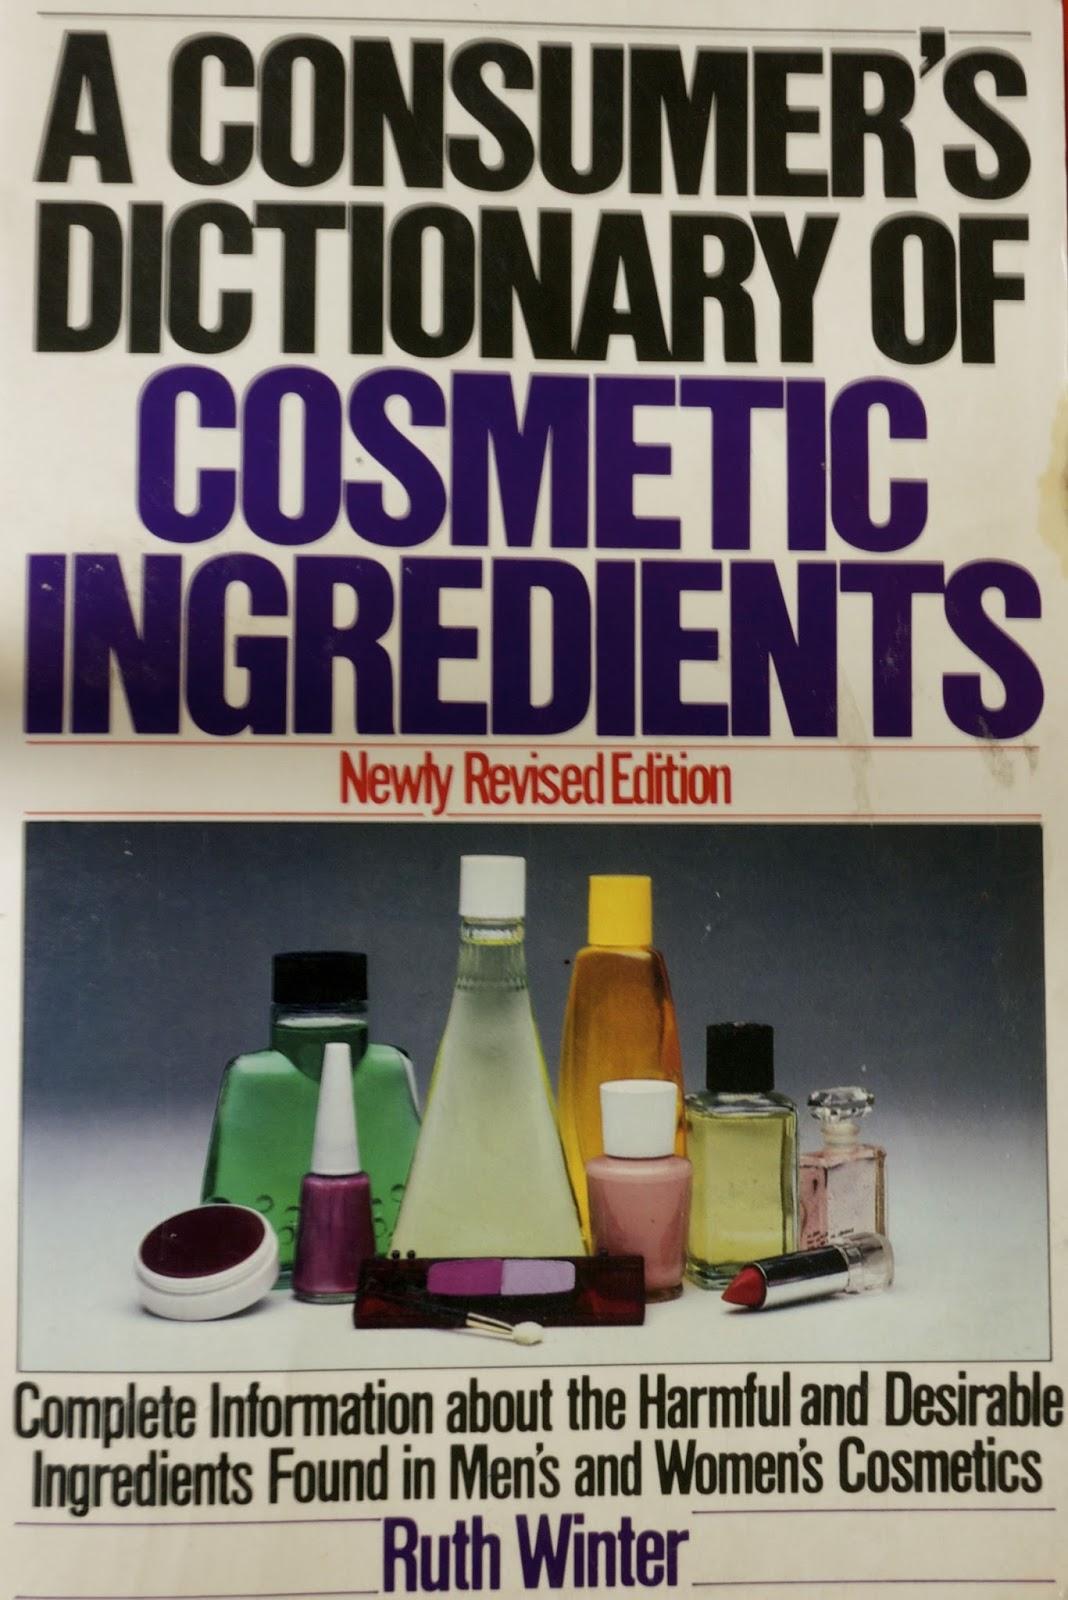 Bookshelf: A Consumer's Dictonary Of Cosmetics Ingredients